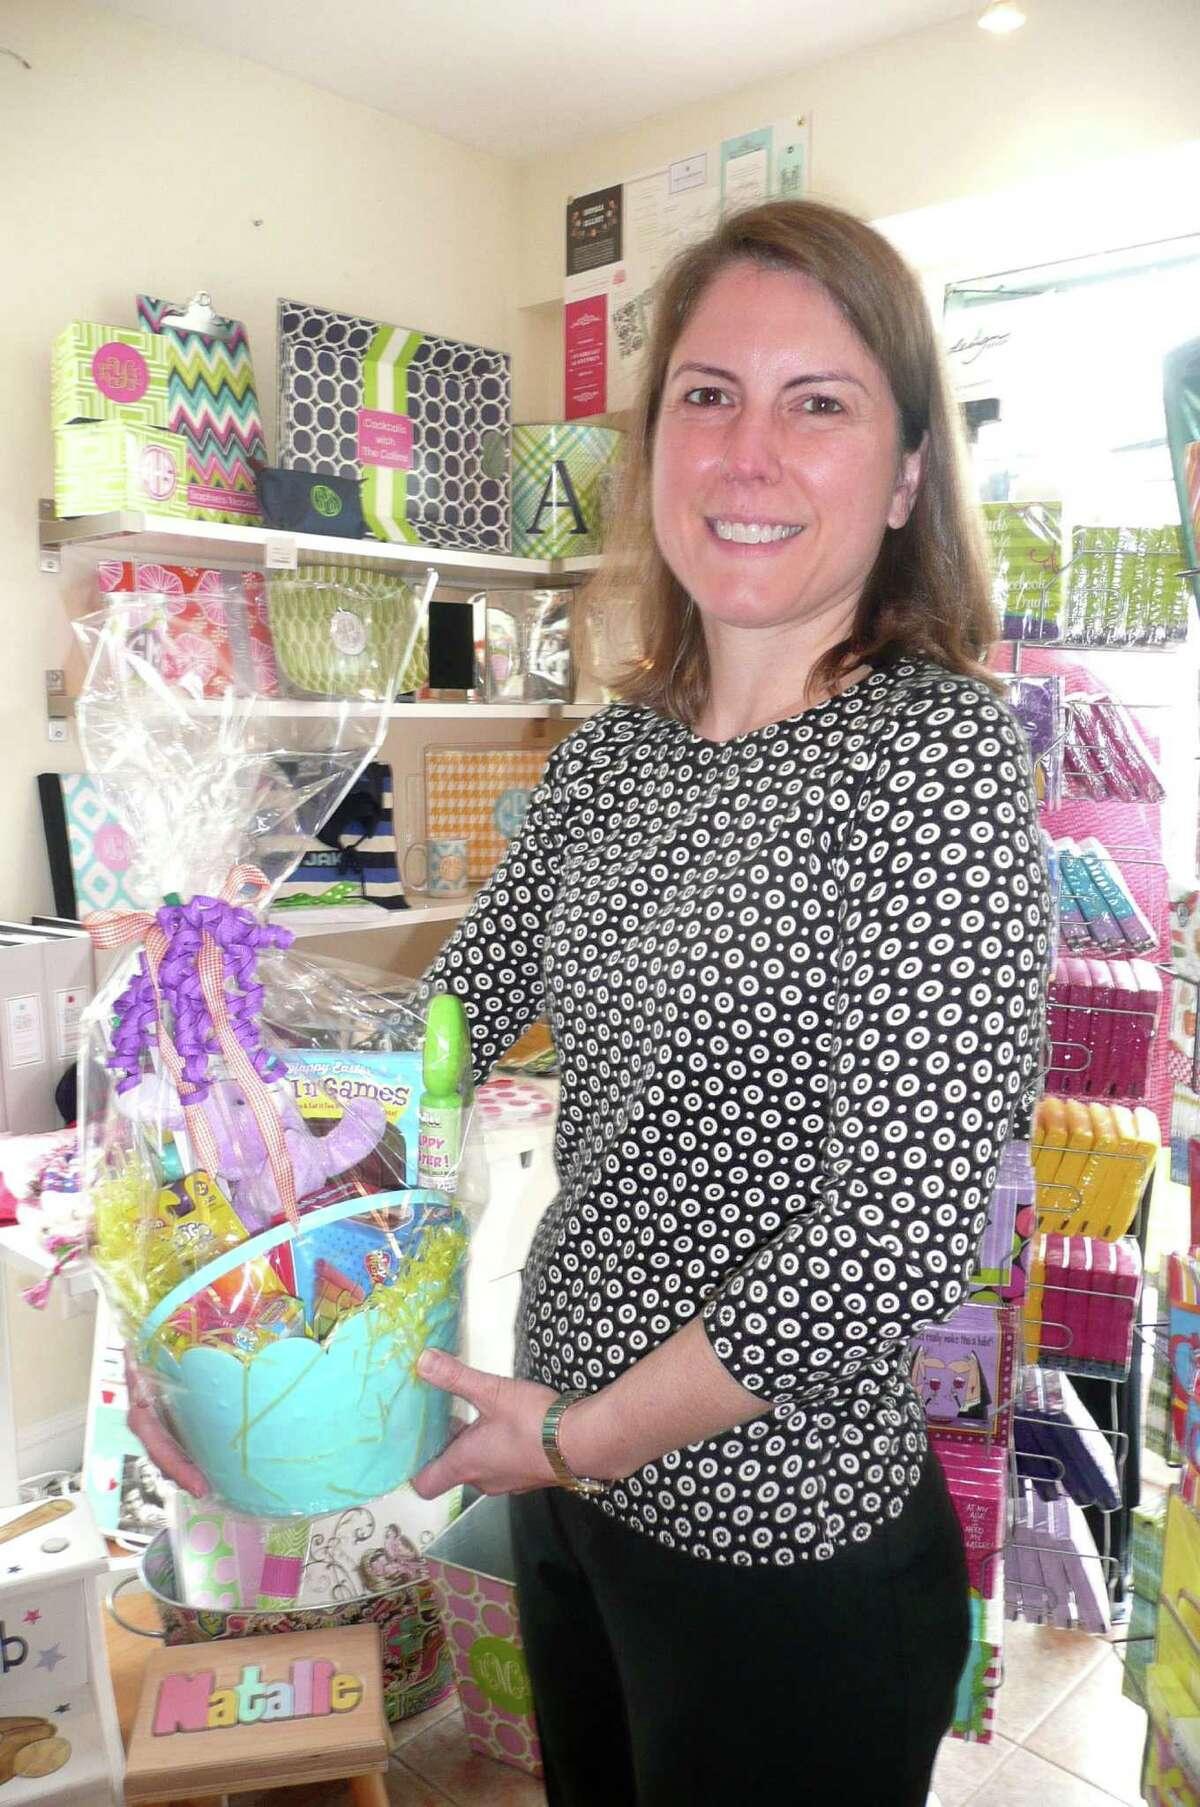 Splurge owner Sonia Malloy.